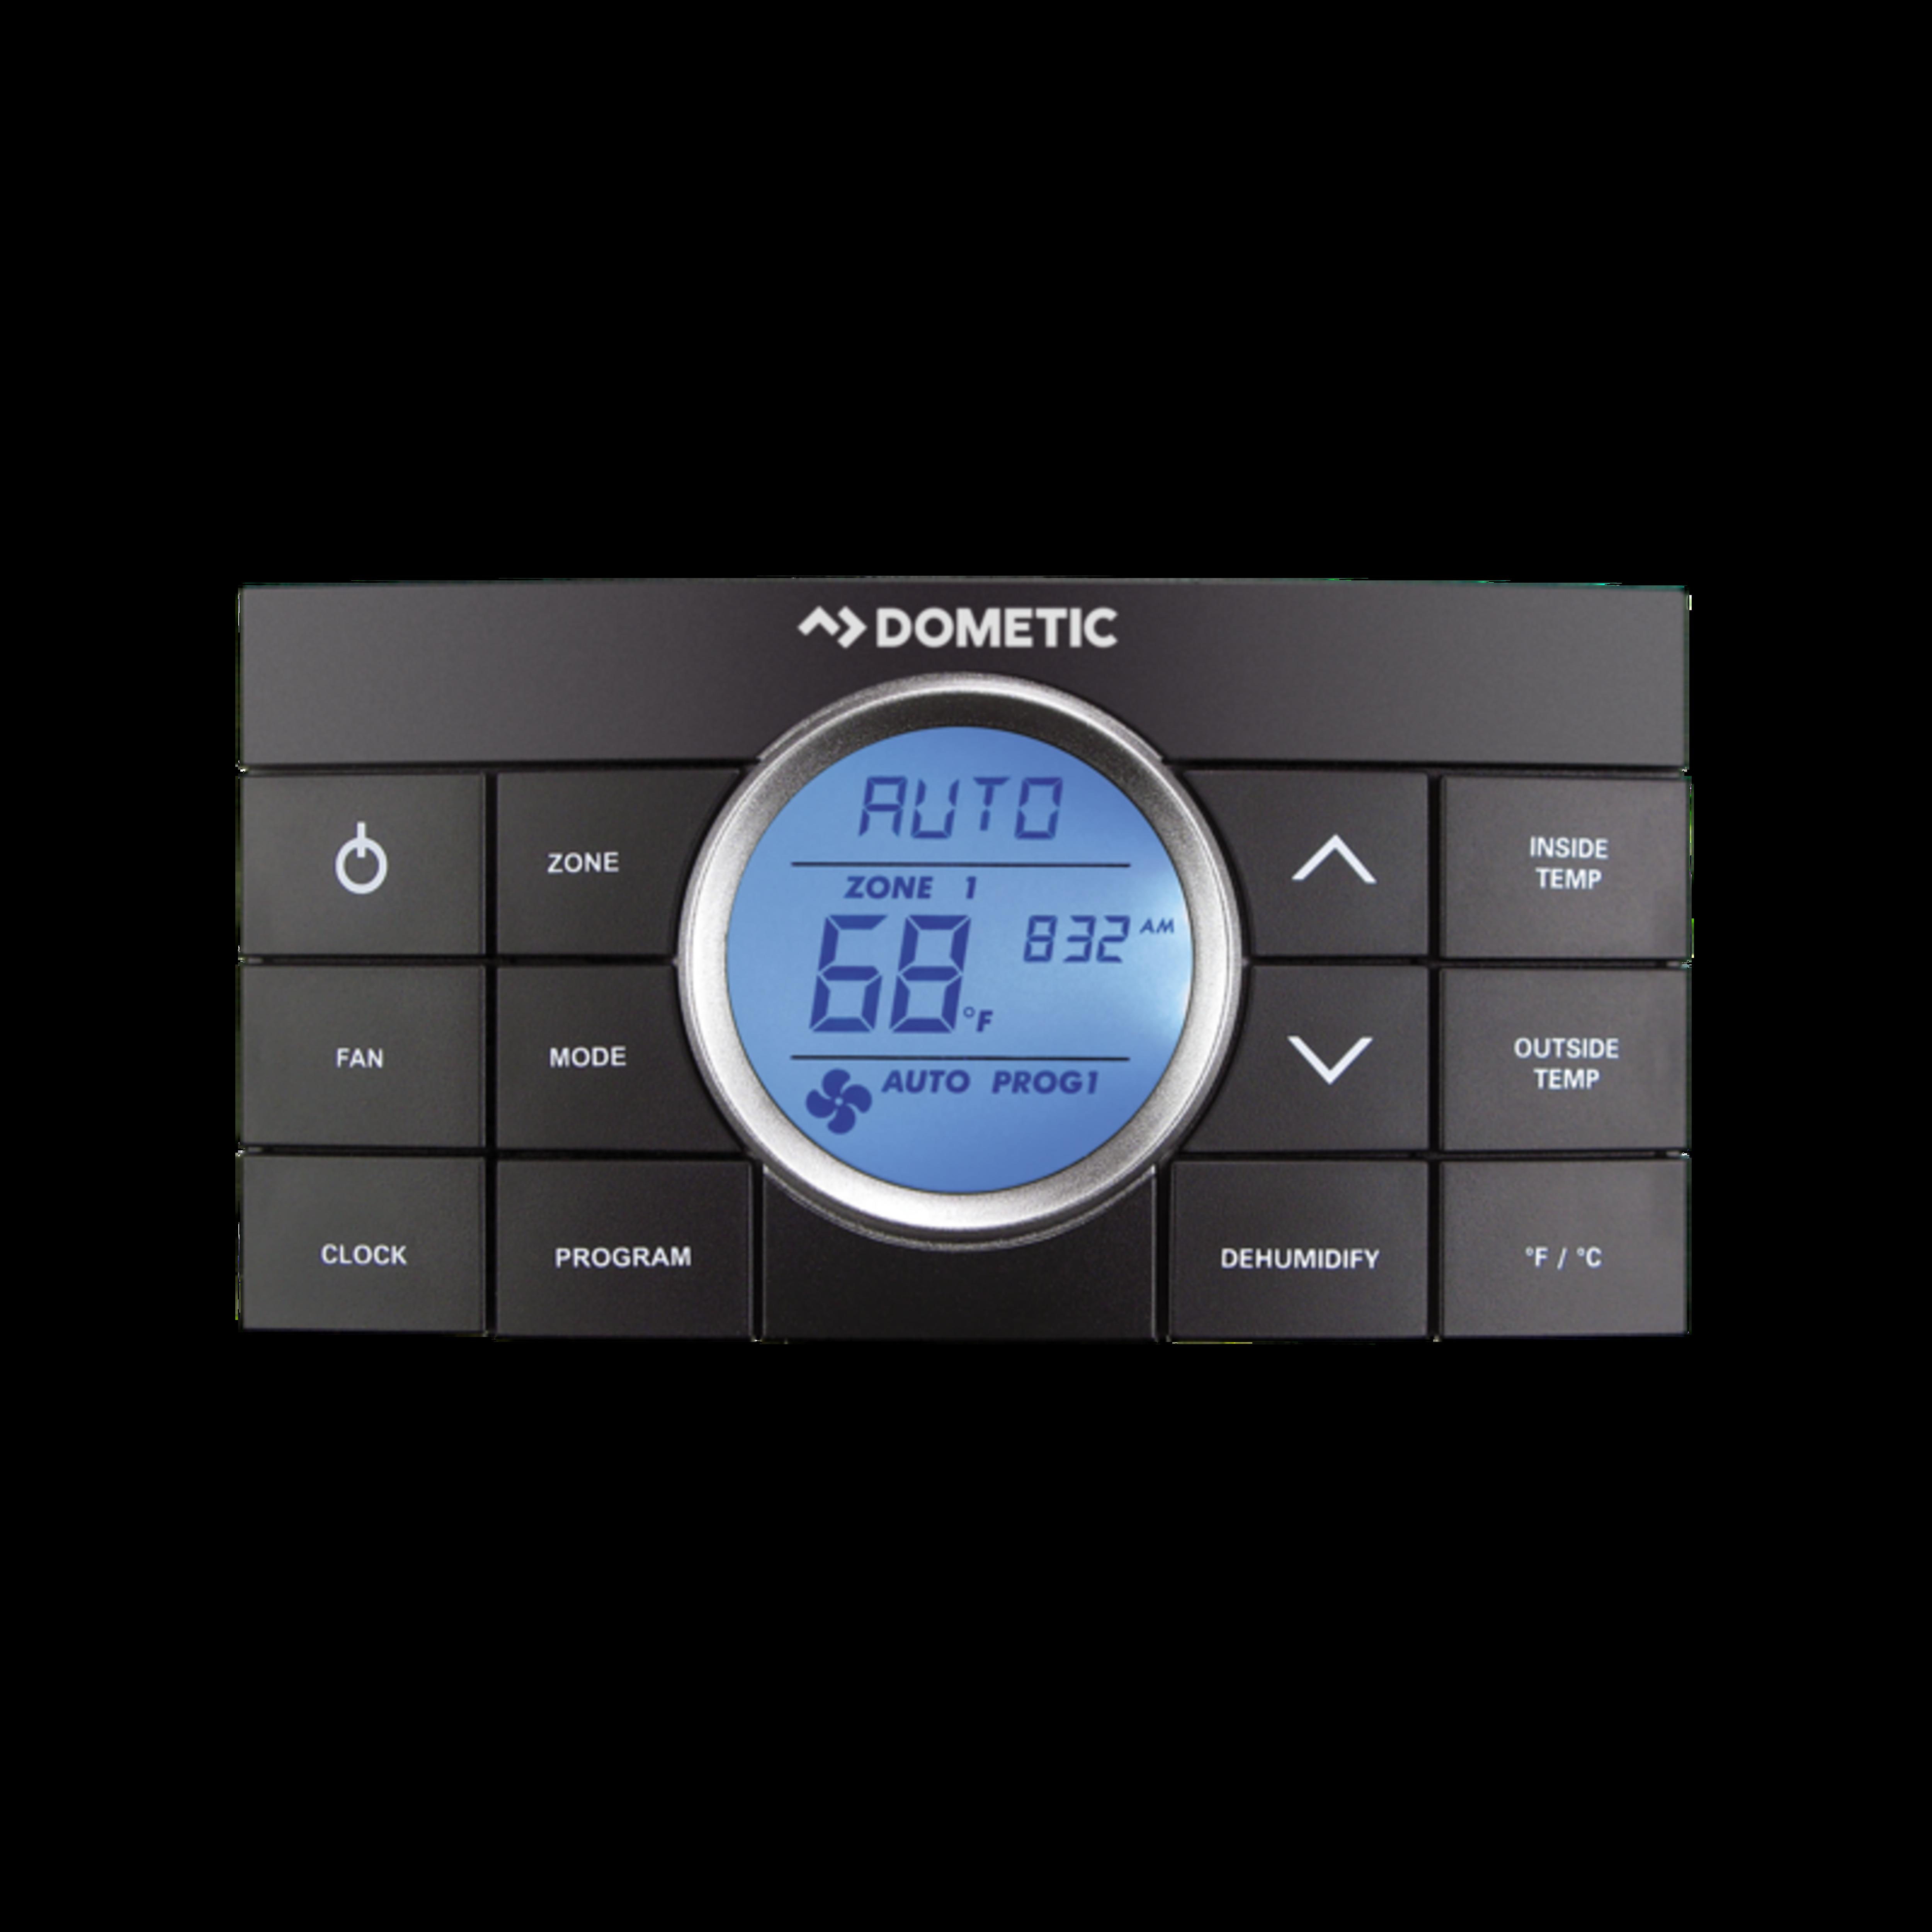 Dometic Comfort Control Board